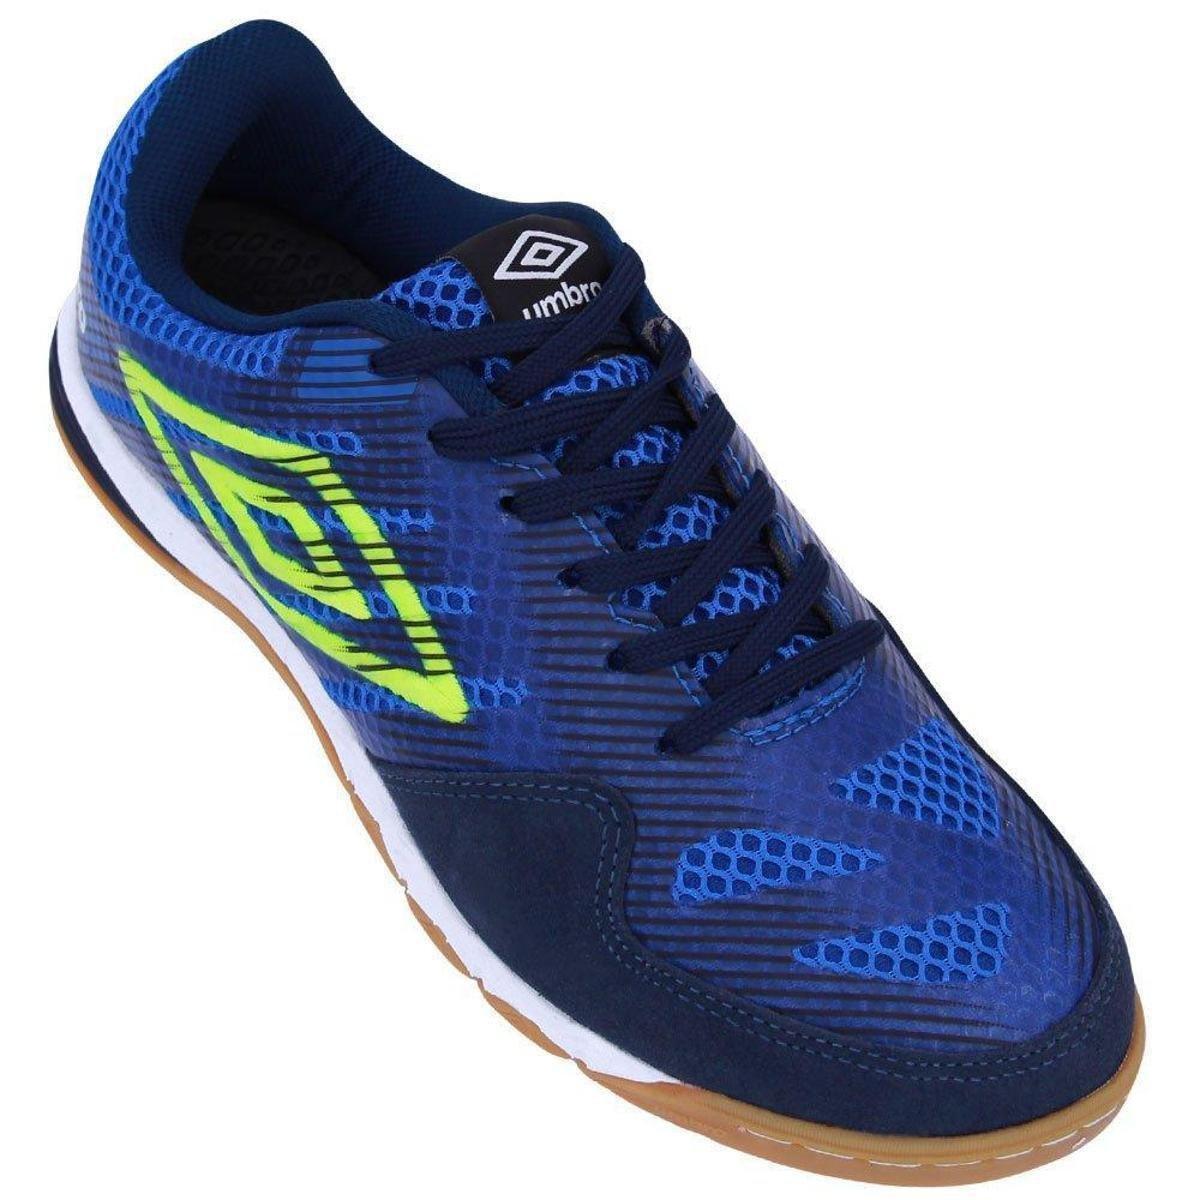 47a007d44 Tênis Umbro Futsal Pro IV - Compre Agora